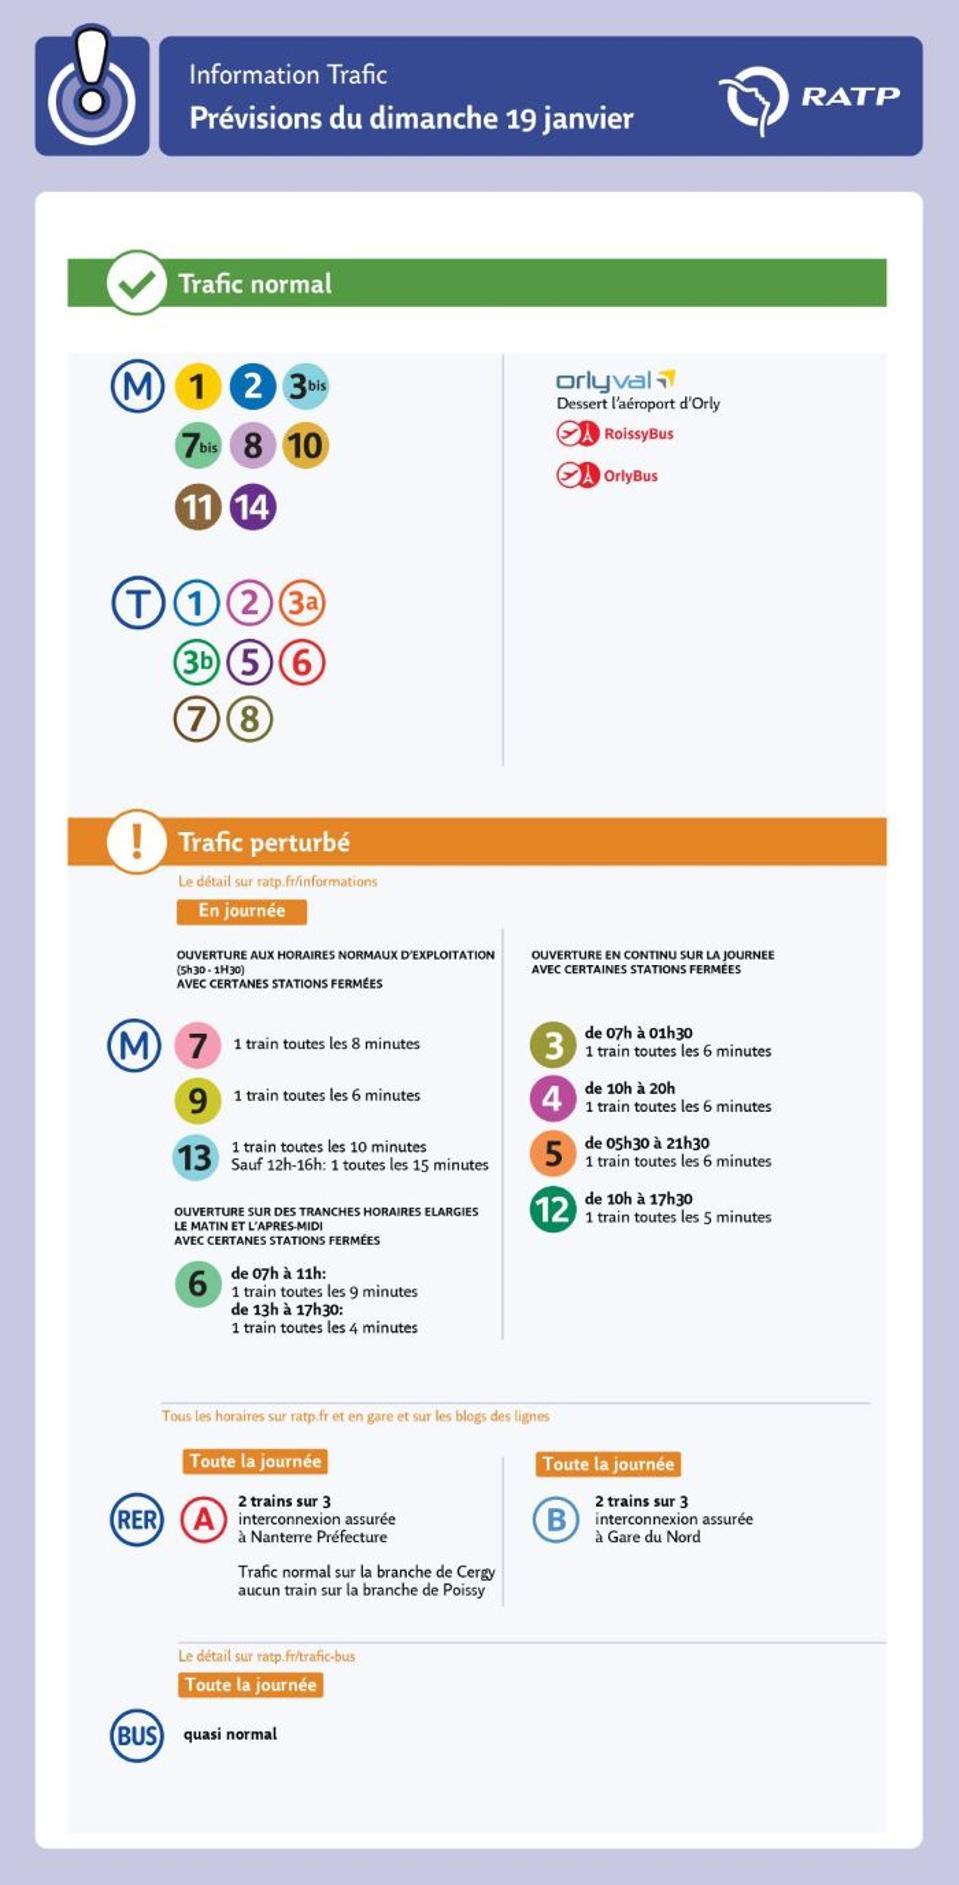 RATP Paris traffic information